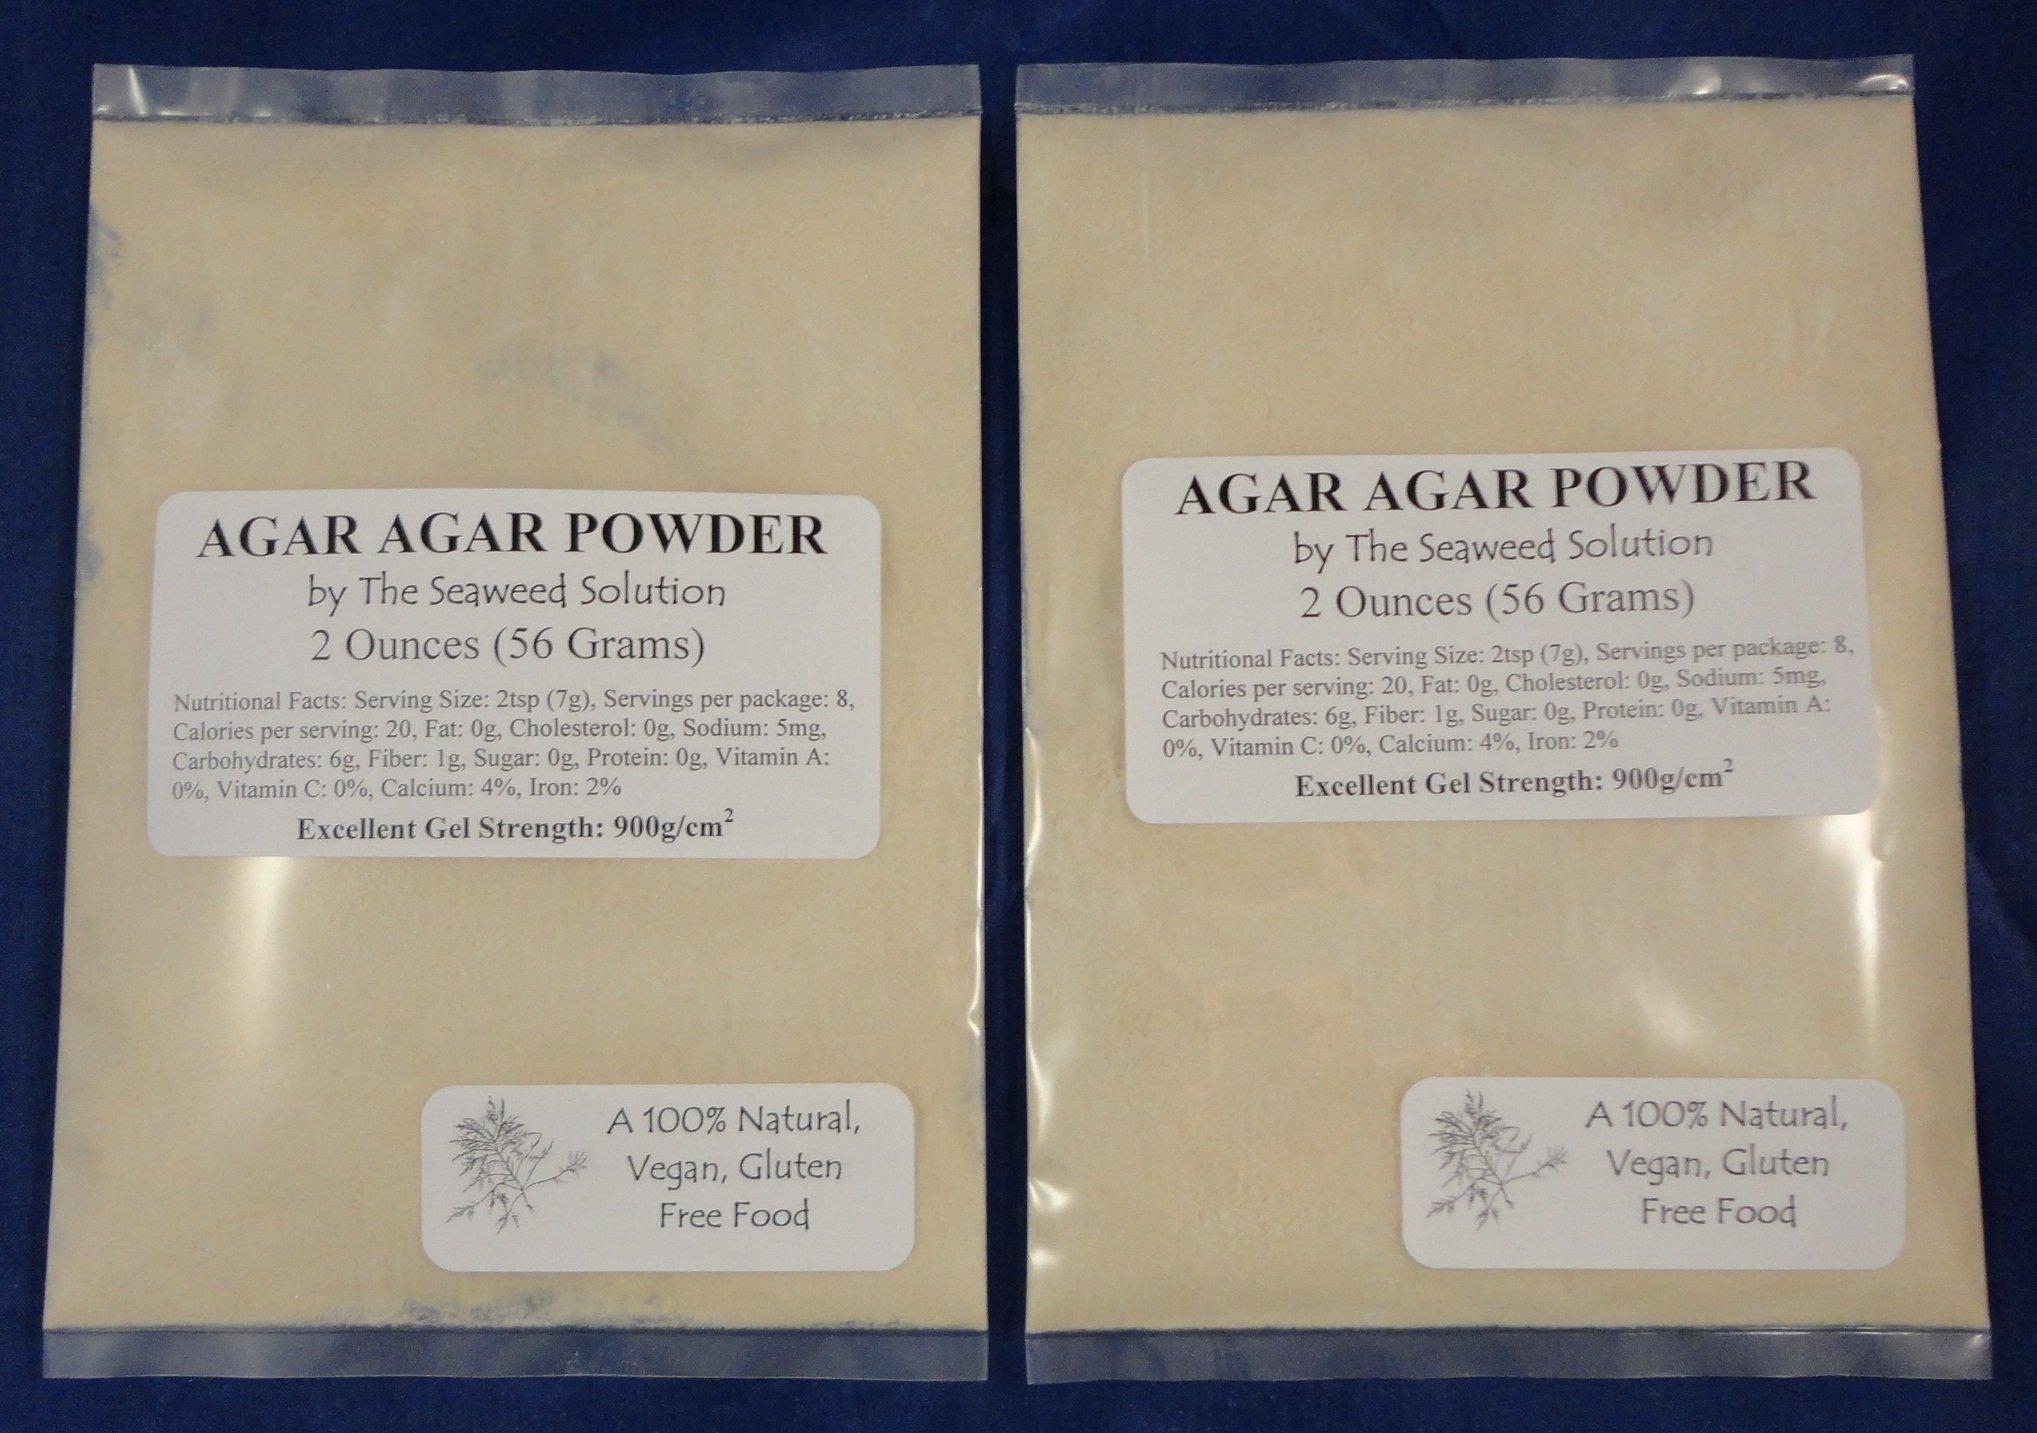 Agar Agar Powder 2oz (2 pack) - Excellent Gel Strength 900g/cm2